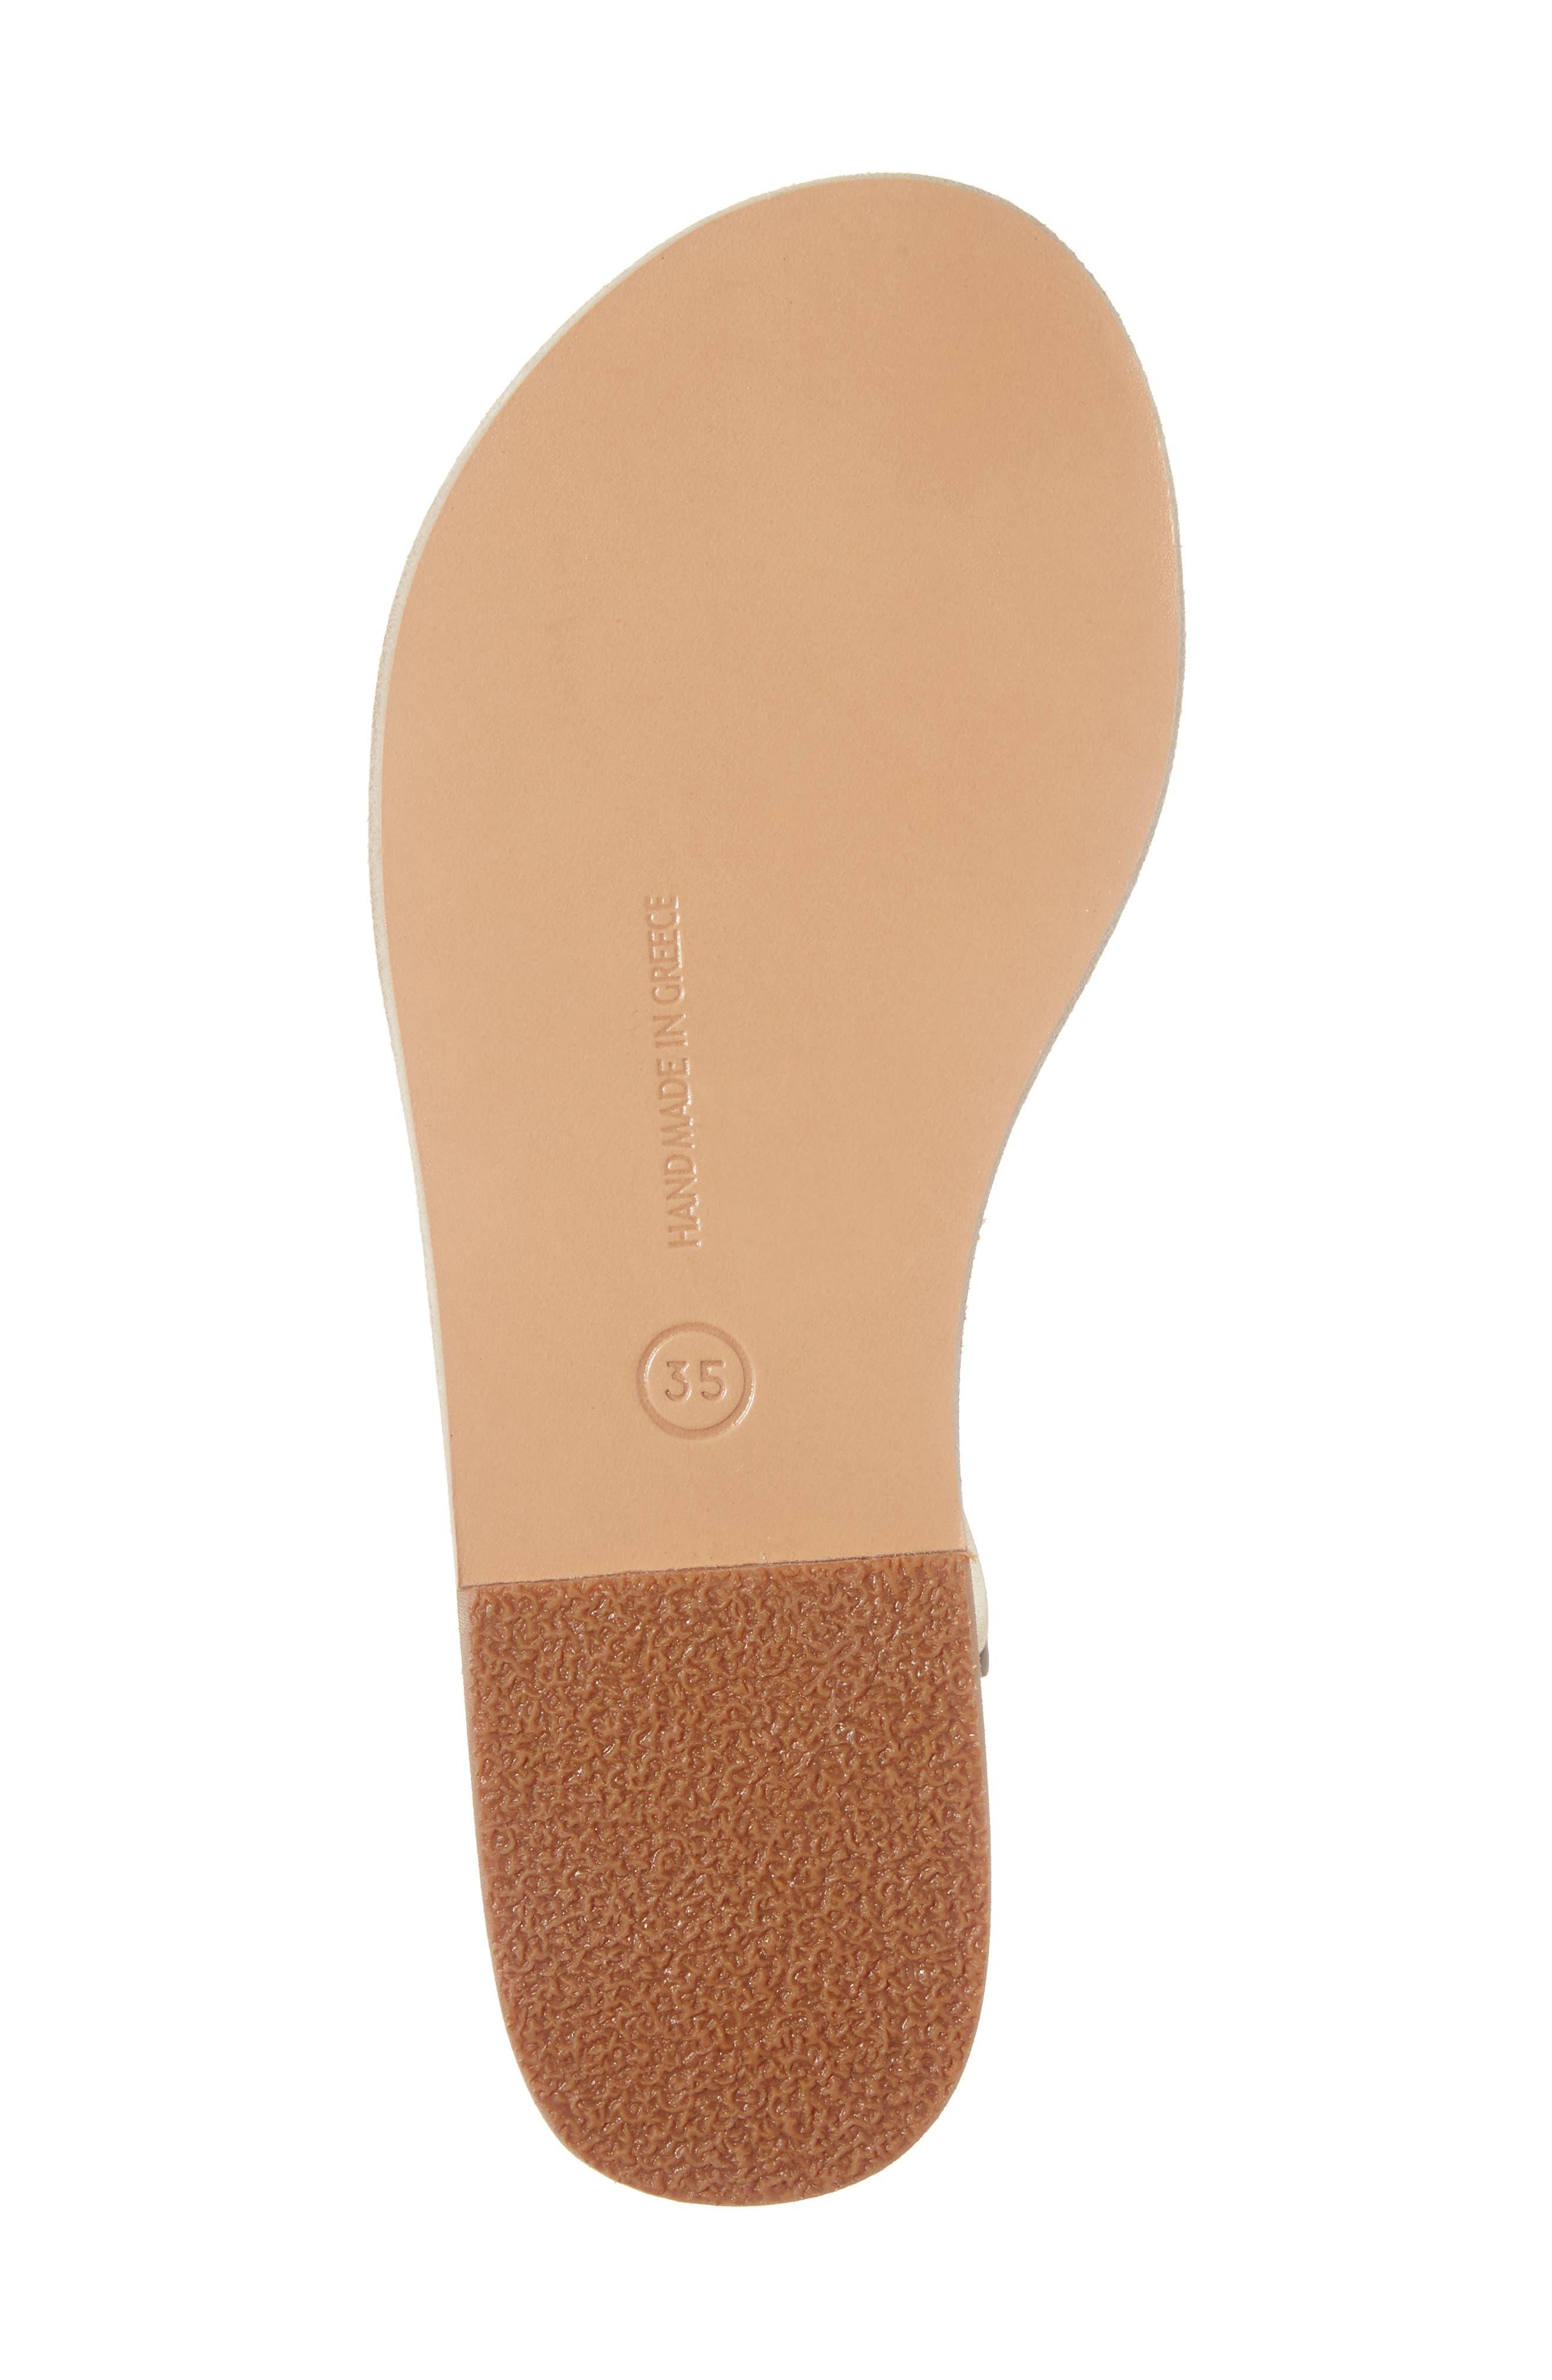 Lito Imitation Pearl Embellished T-Strap Sandal,                             Alternate thumbnail 6, color,                             040